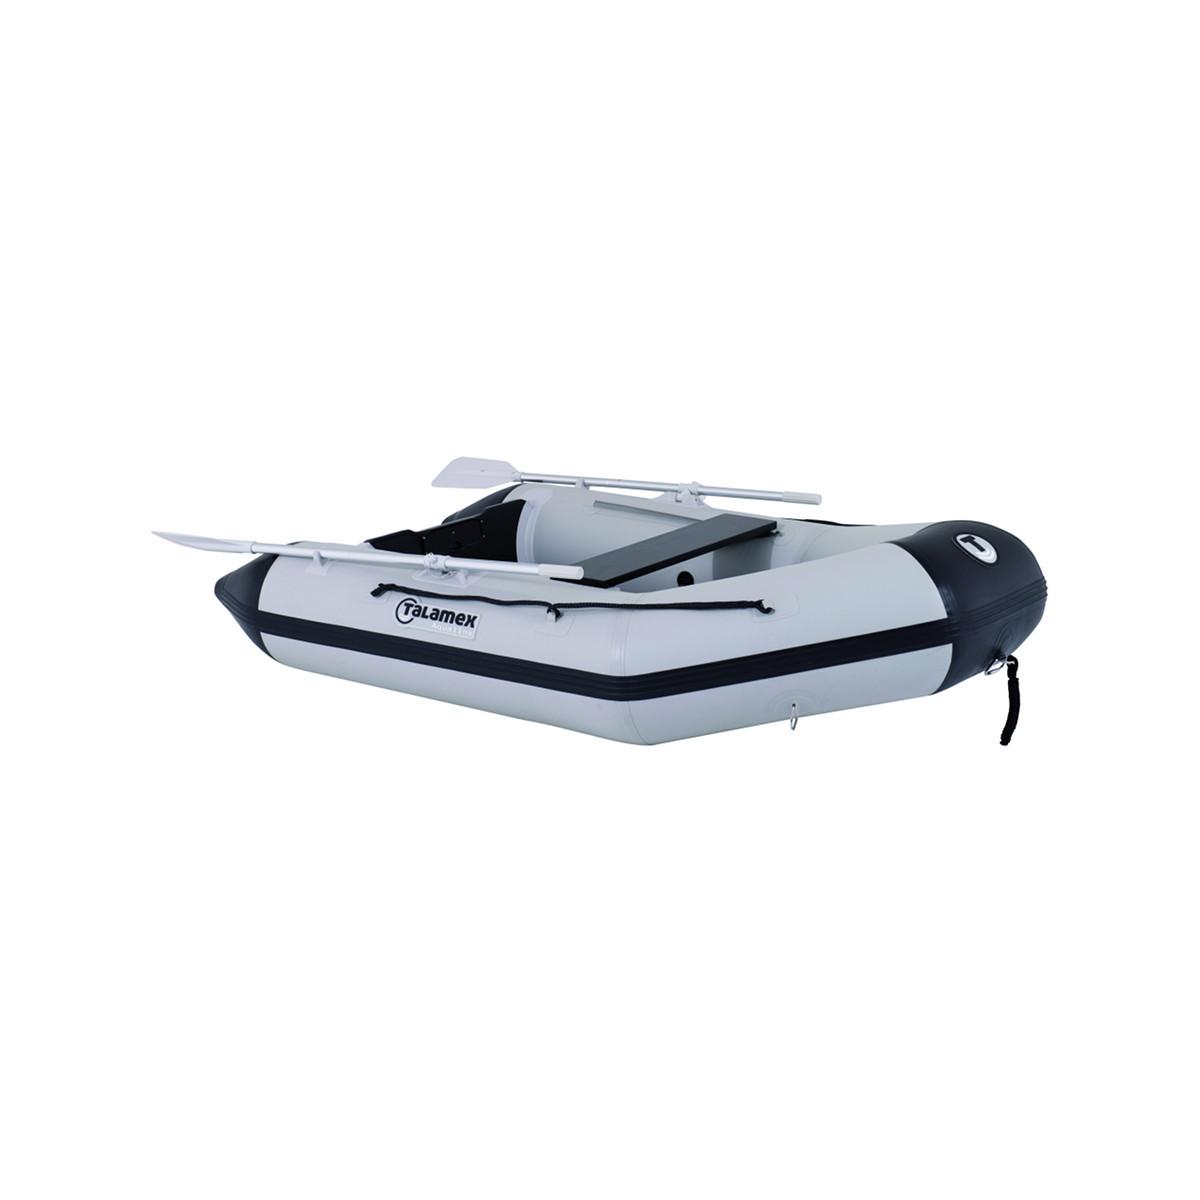 Talamex Aqualine QLS200 opblaasbare rubberboot met lattenbodem, lengte 2,00m, grijs